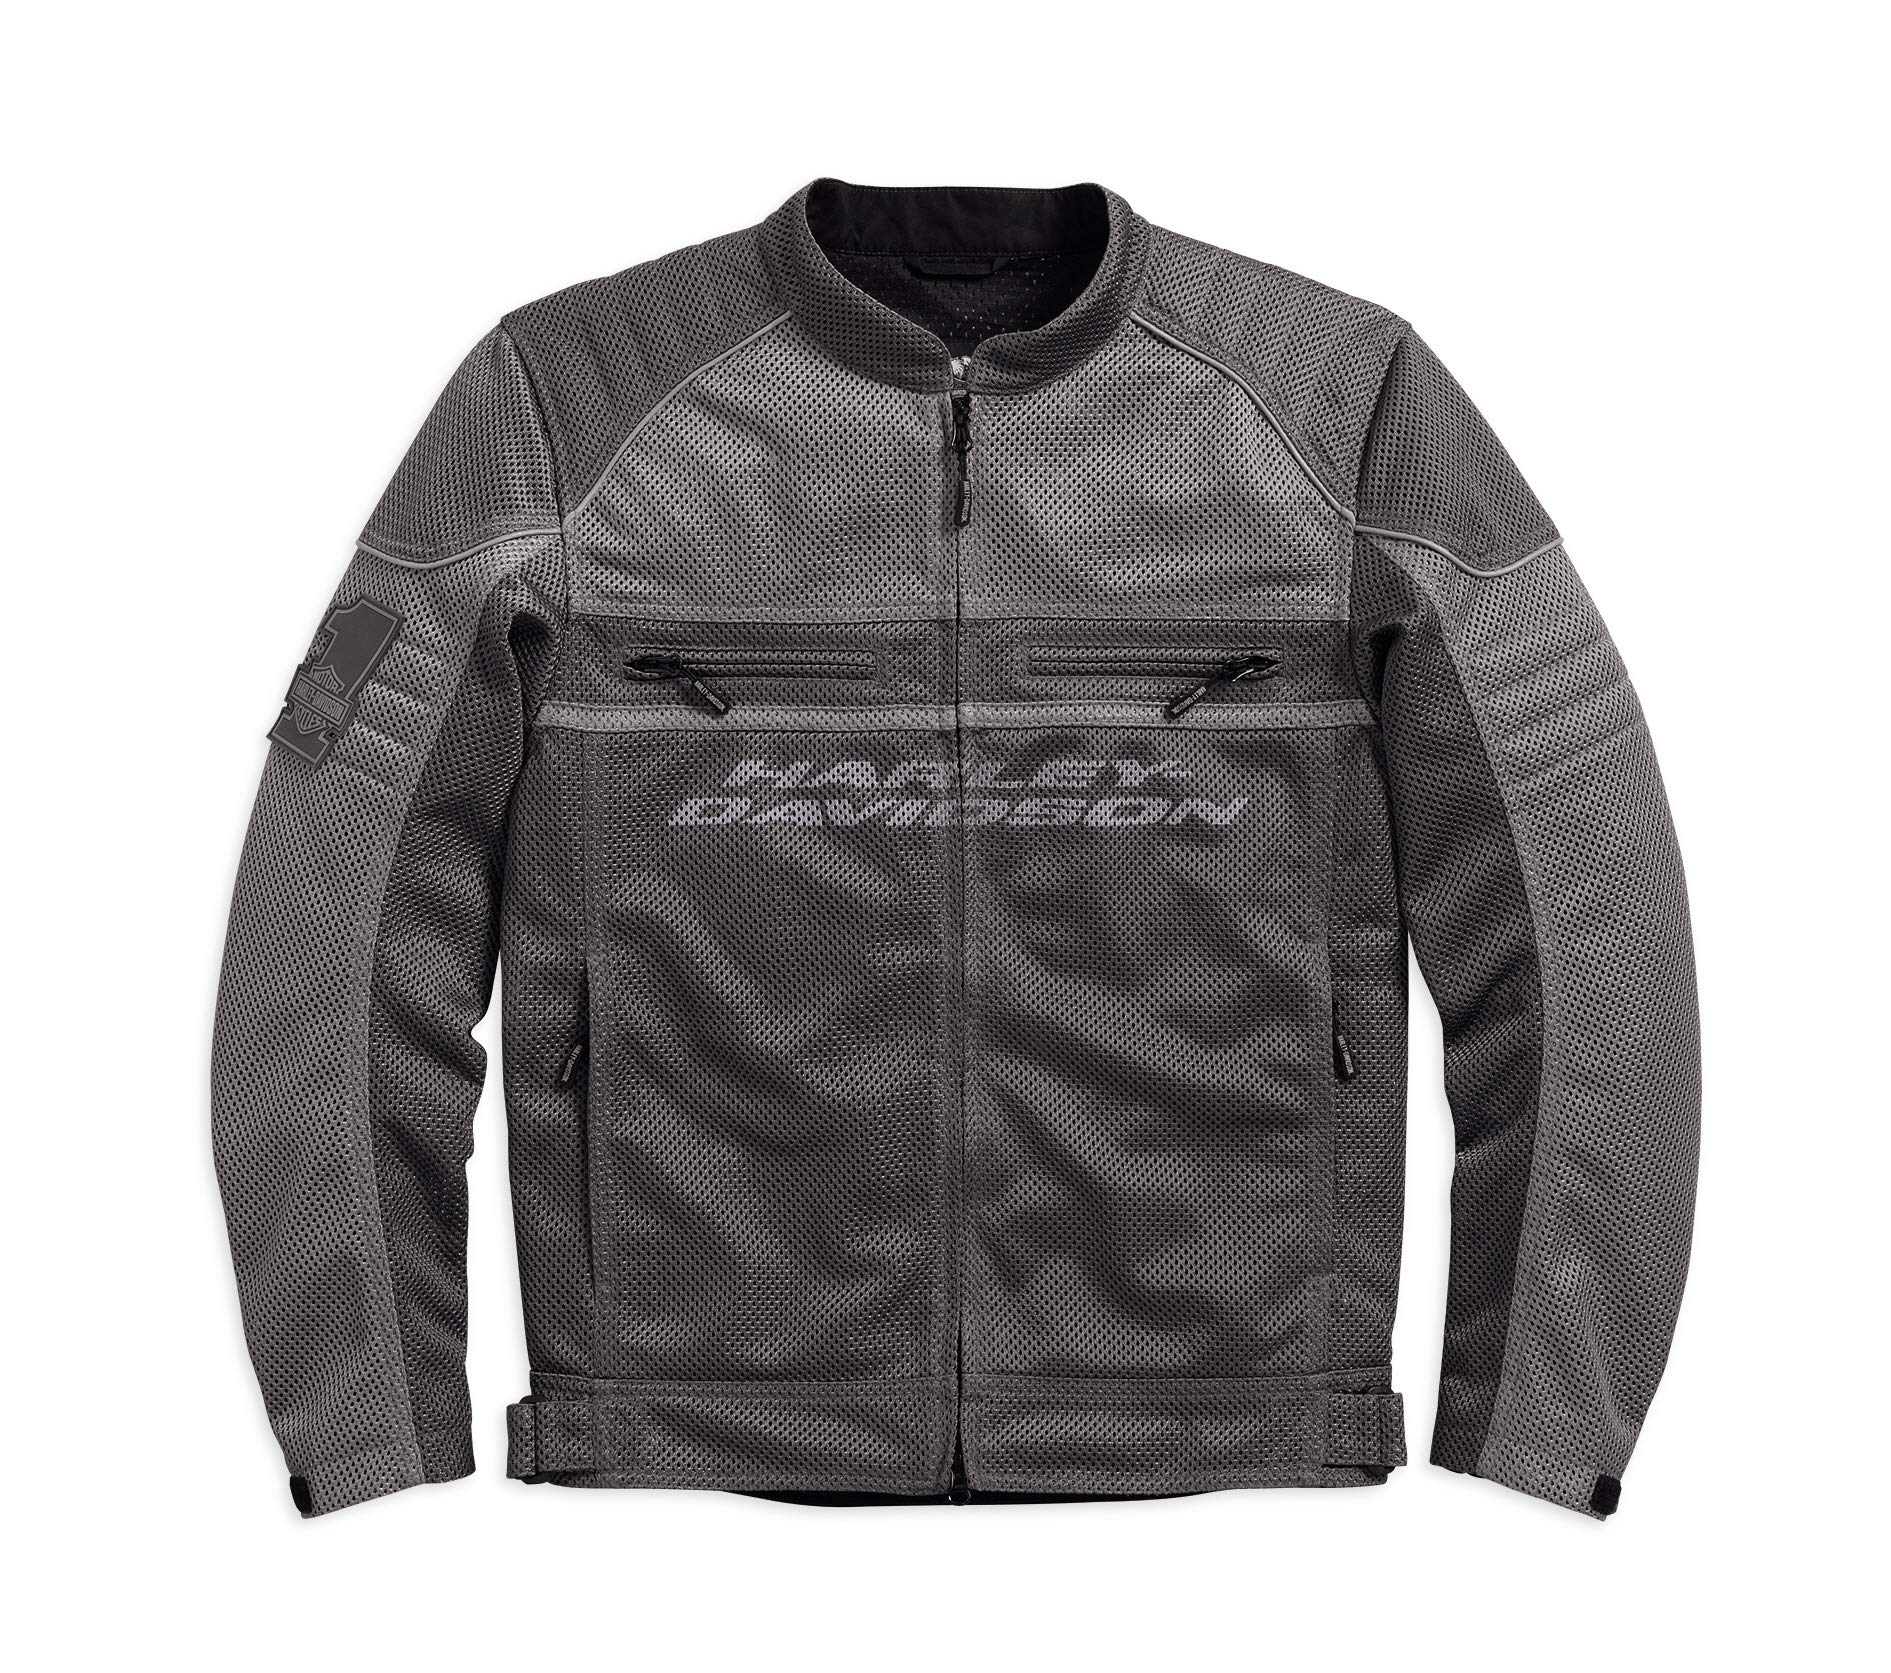 Harley-Davidson Official Men's Affinity Mesh Riding Jacket, Grey (X-Large)